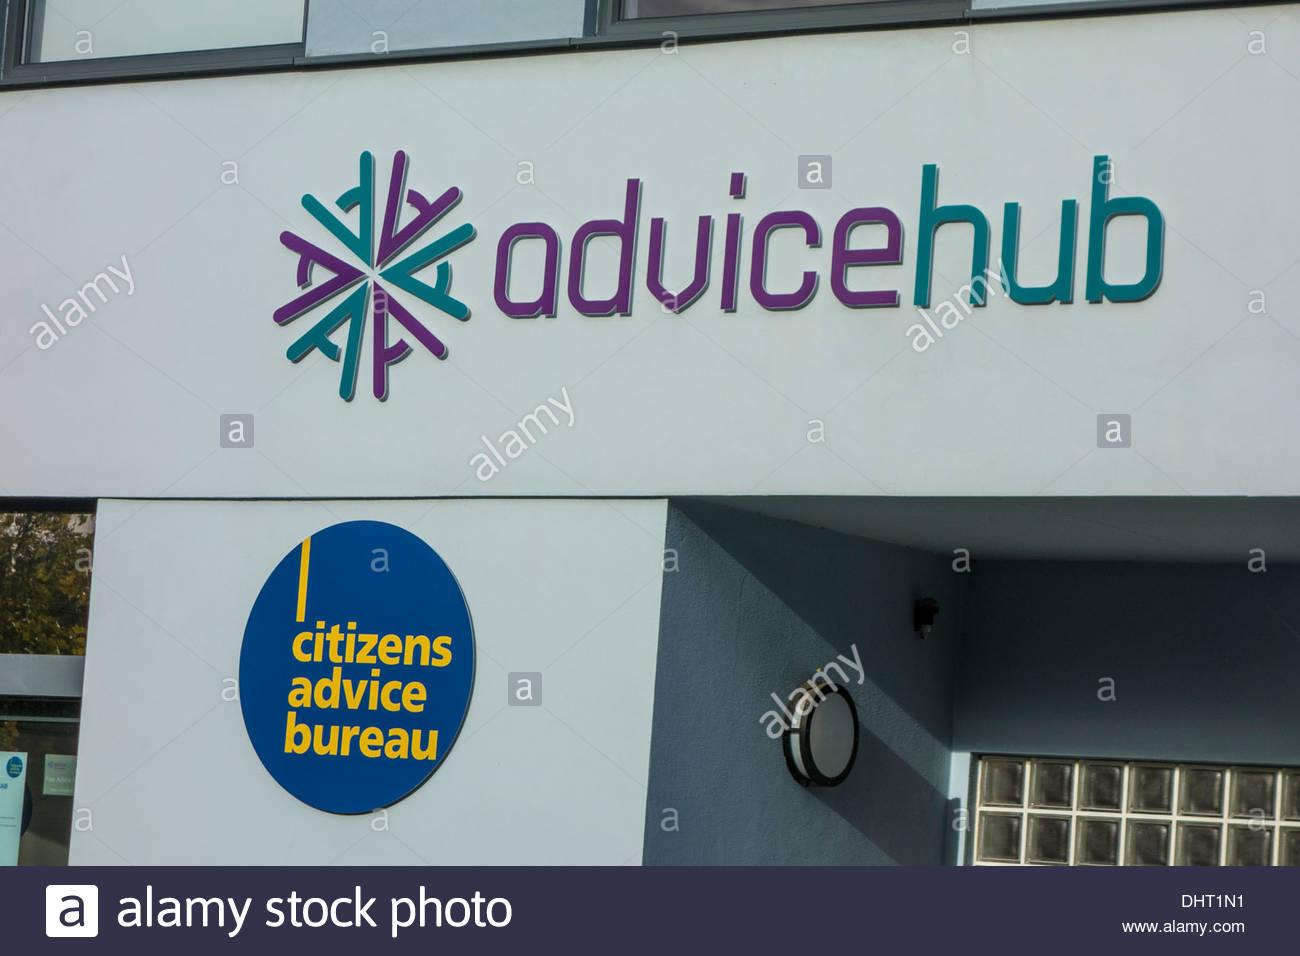 Cambridge advicehub and citizens advice bureau stock photo: 62608477